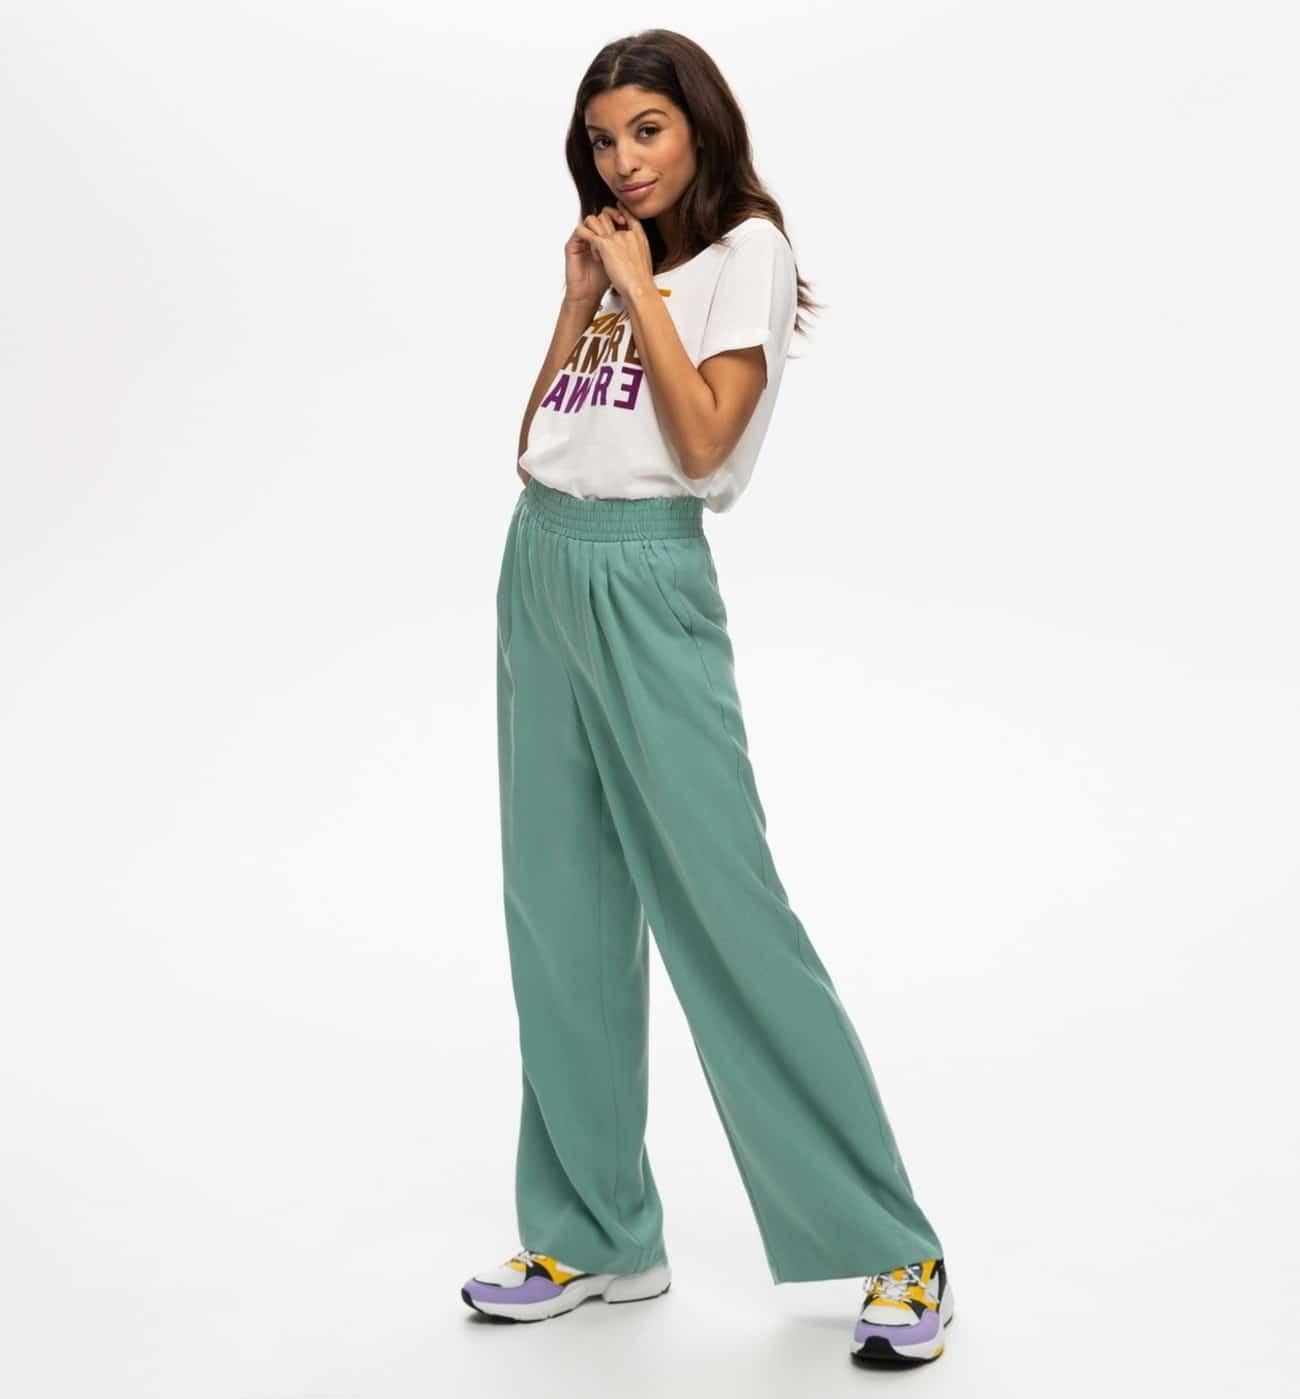 Pantalon large en lyocell, Promod, Promod, 39,95€.